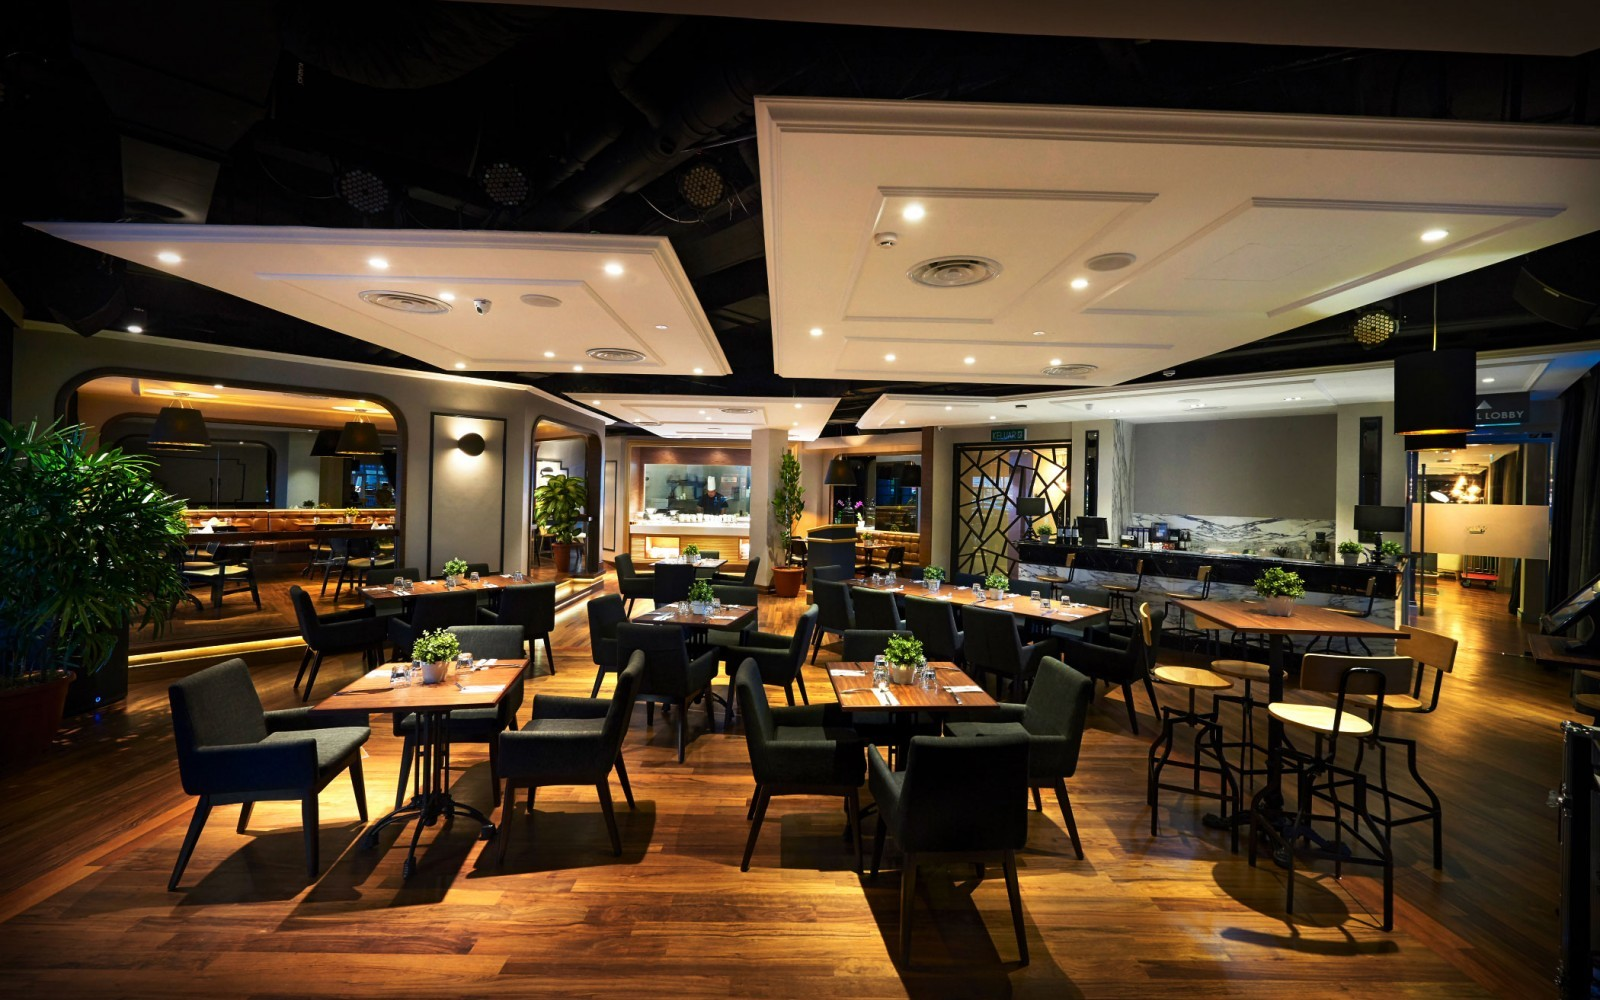 restaurant cafe bar in miri sarawak malaysia bonzer. Black Bedroom Furniture Sets. Home Design Ideas